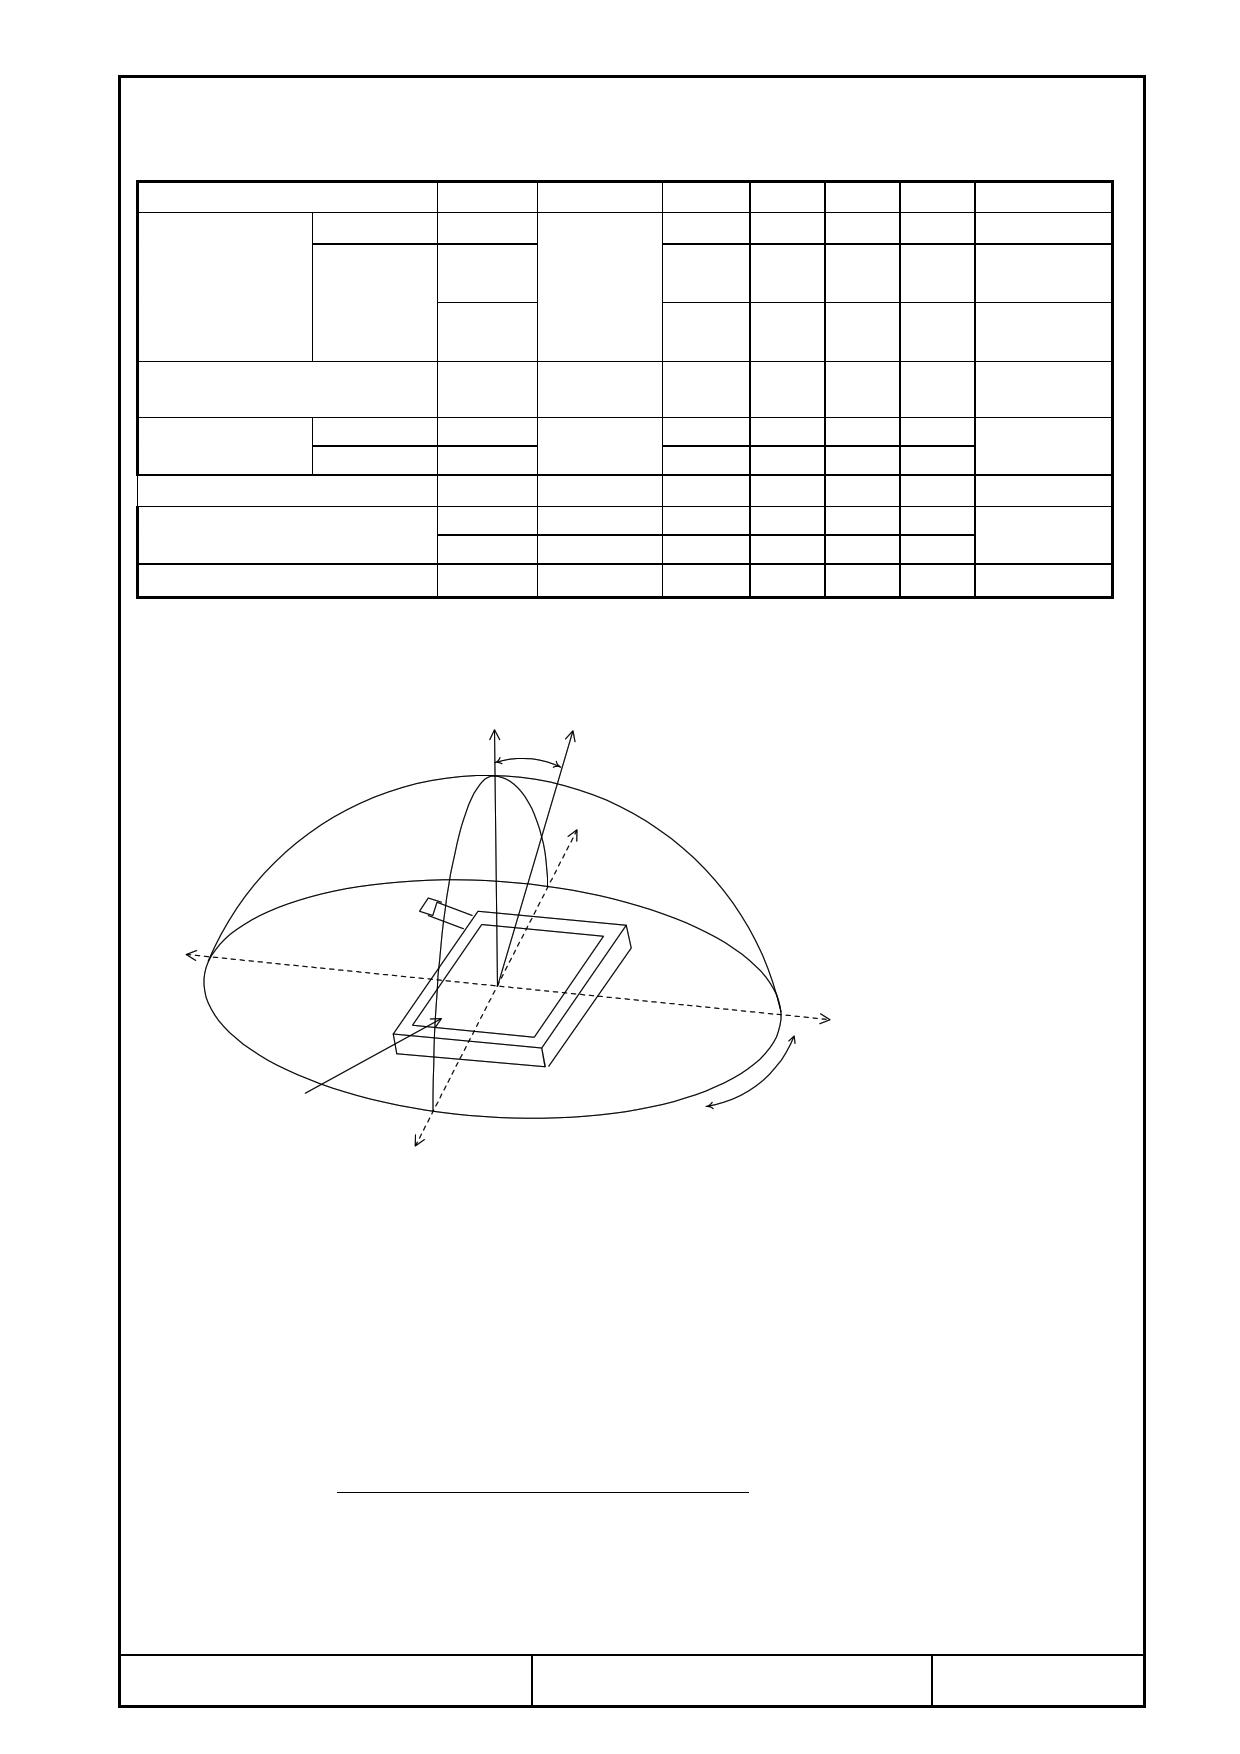 T-51380L050J_FW_P_AC arduino